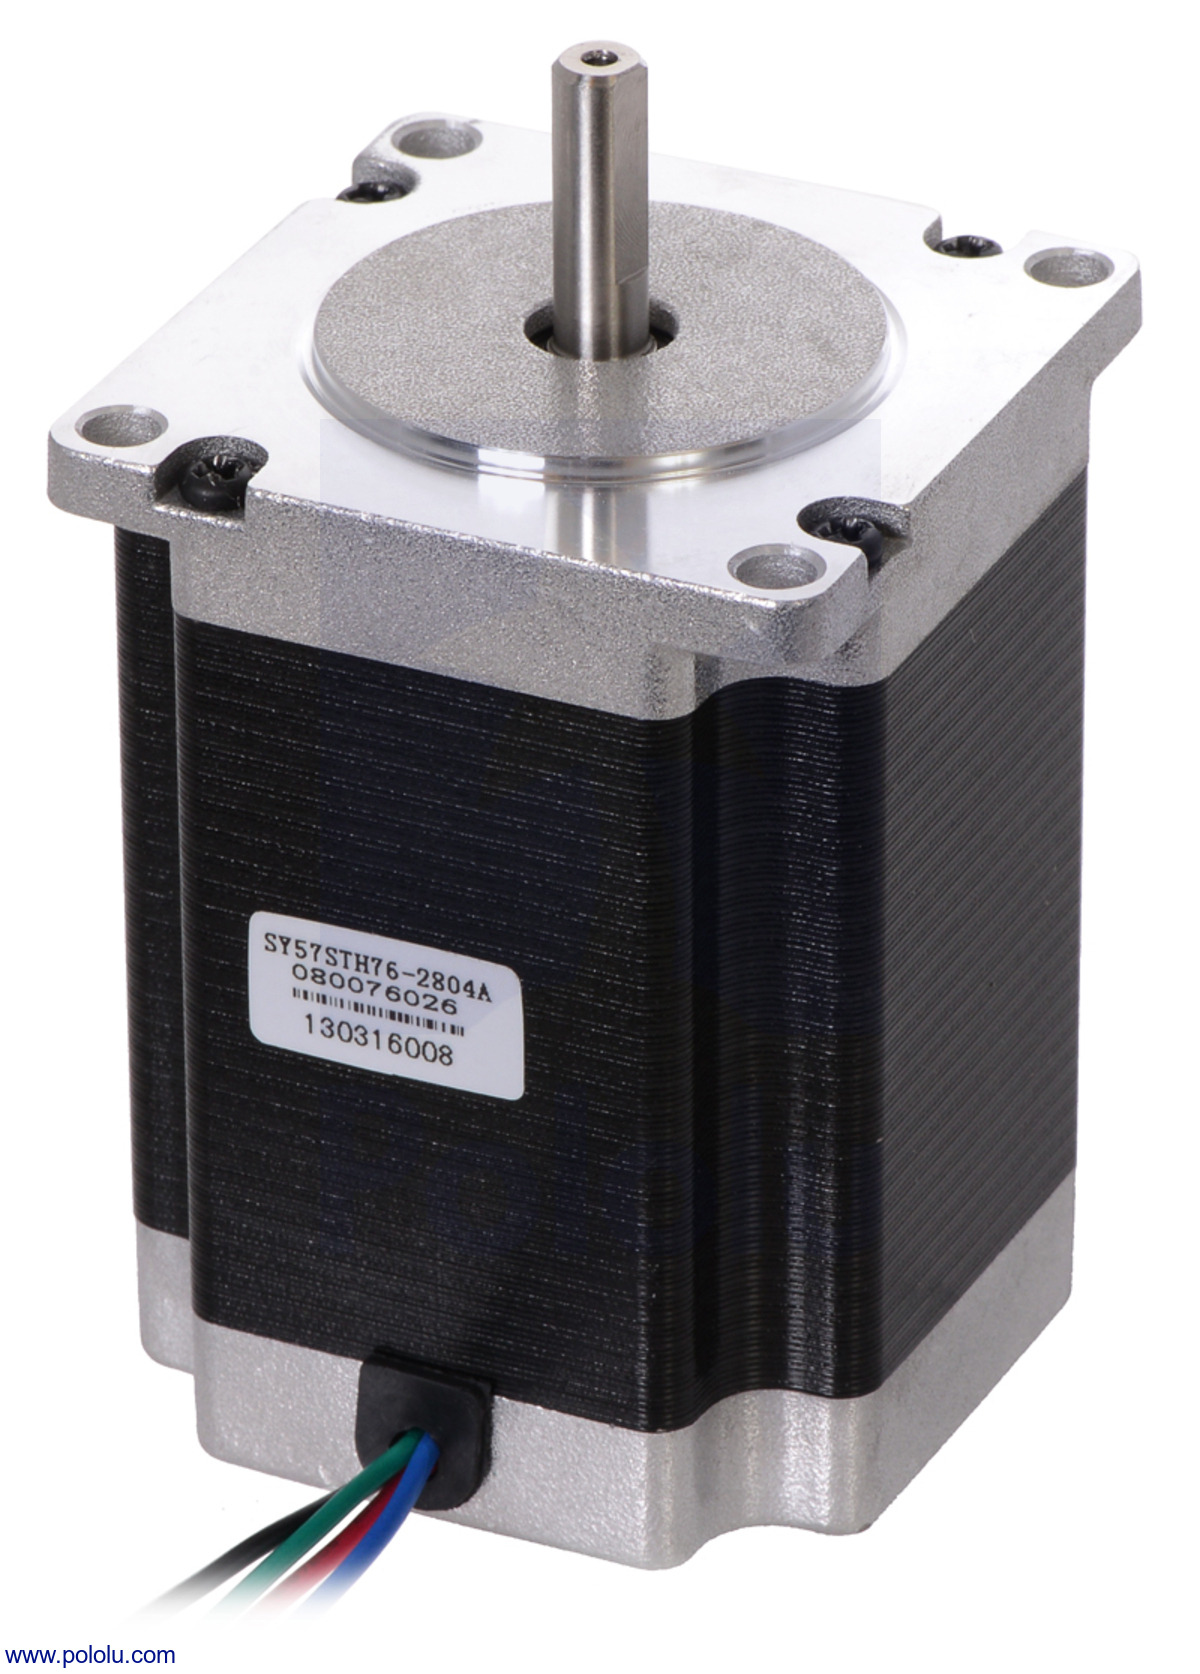 Pololu Stepper Motor Bipolar 200 Steps Rev 5776mm 32v 28 A Wiring Phase